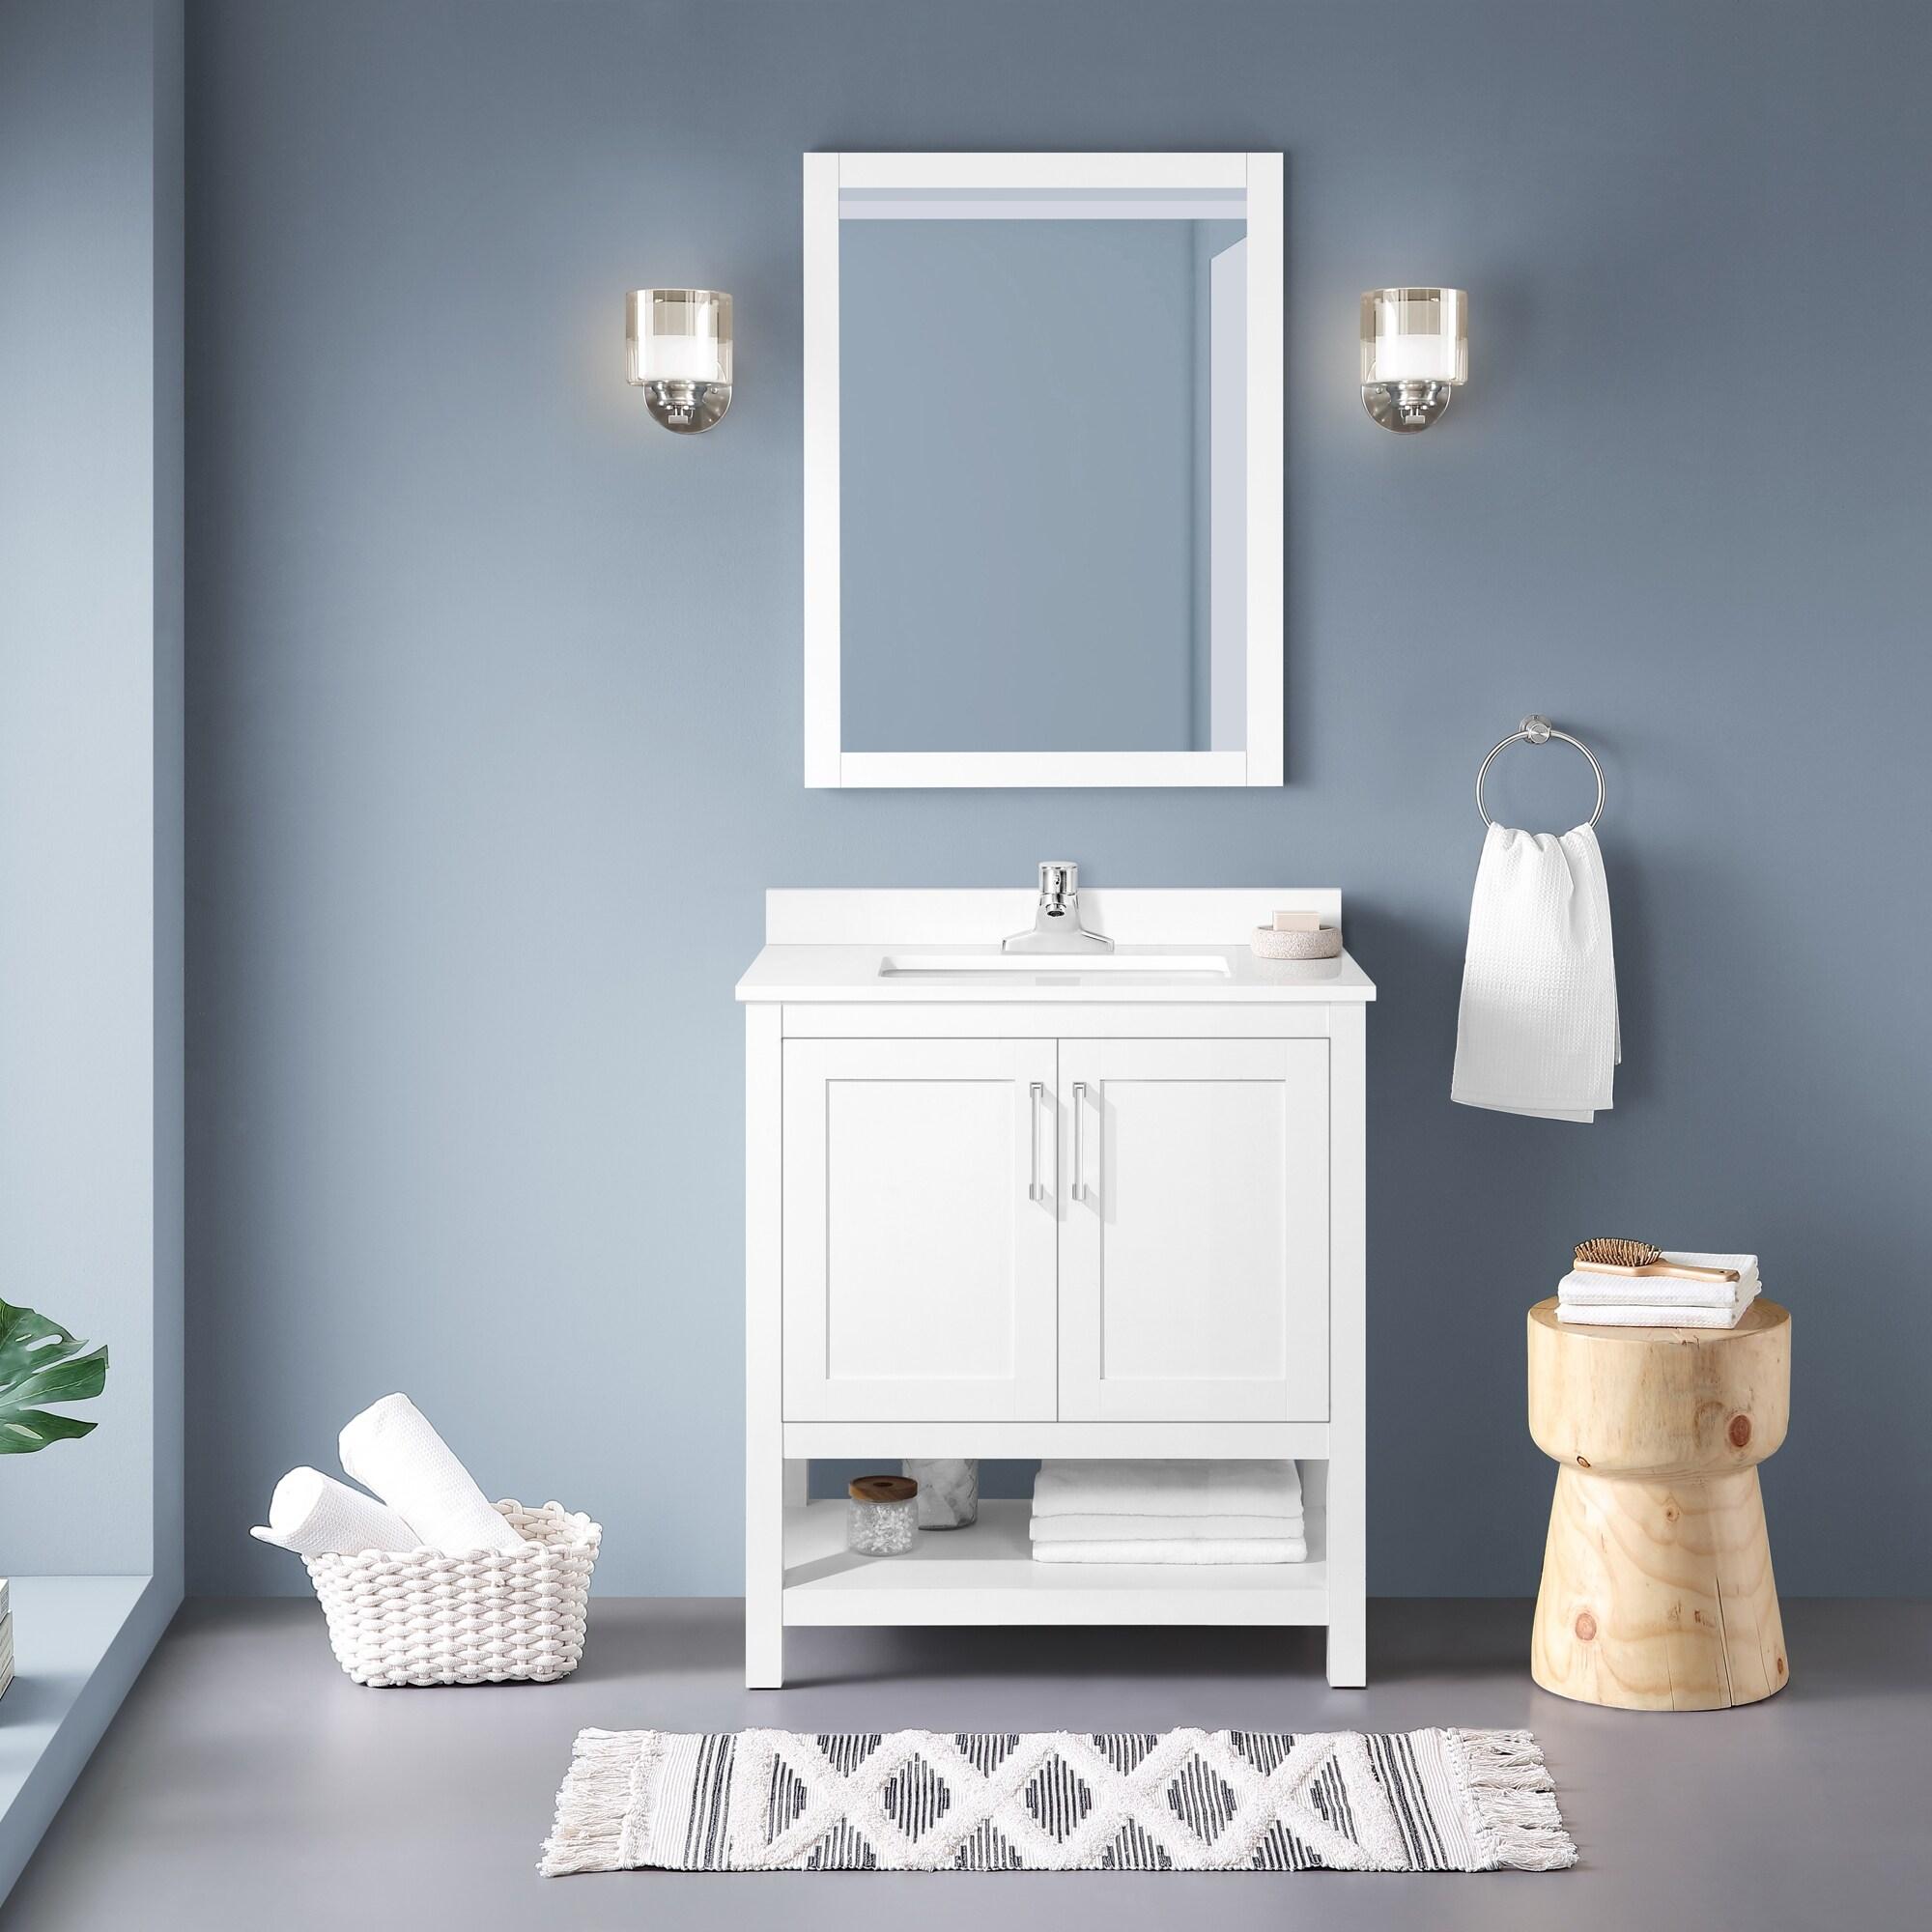 Ove Decors Vegas 30 Bathroom Vanity Combo W Top And Backslplash White Overstock 33576511